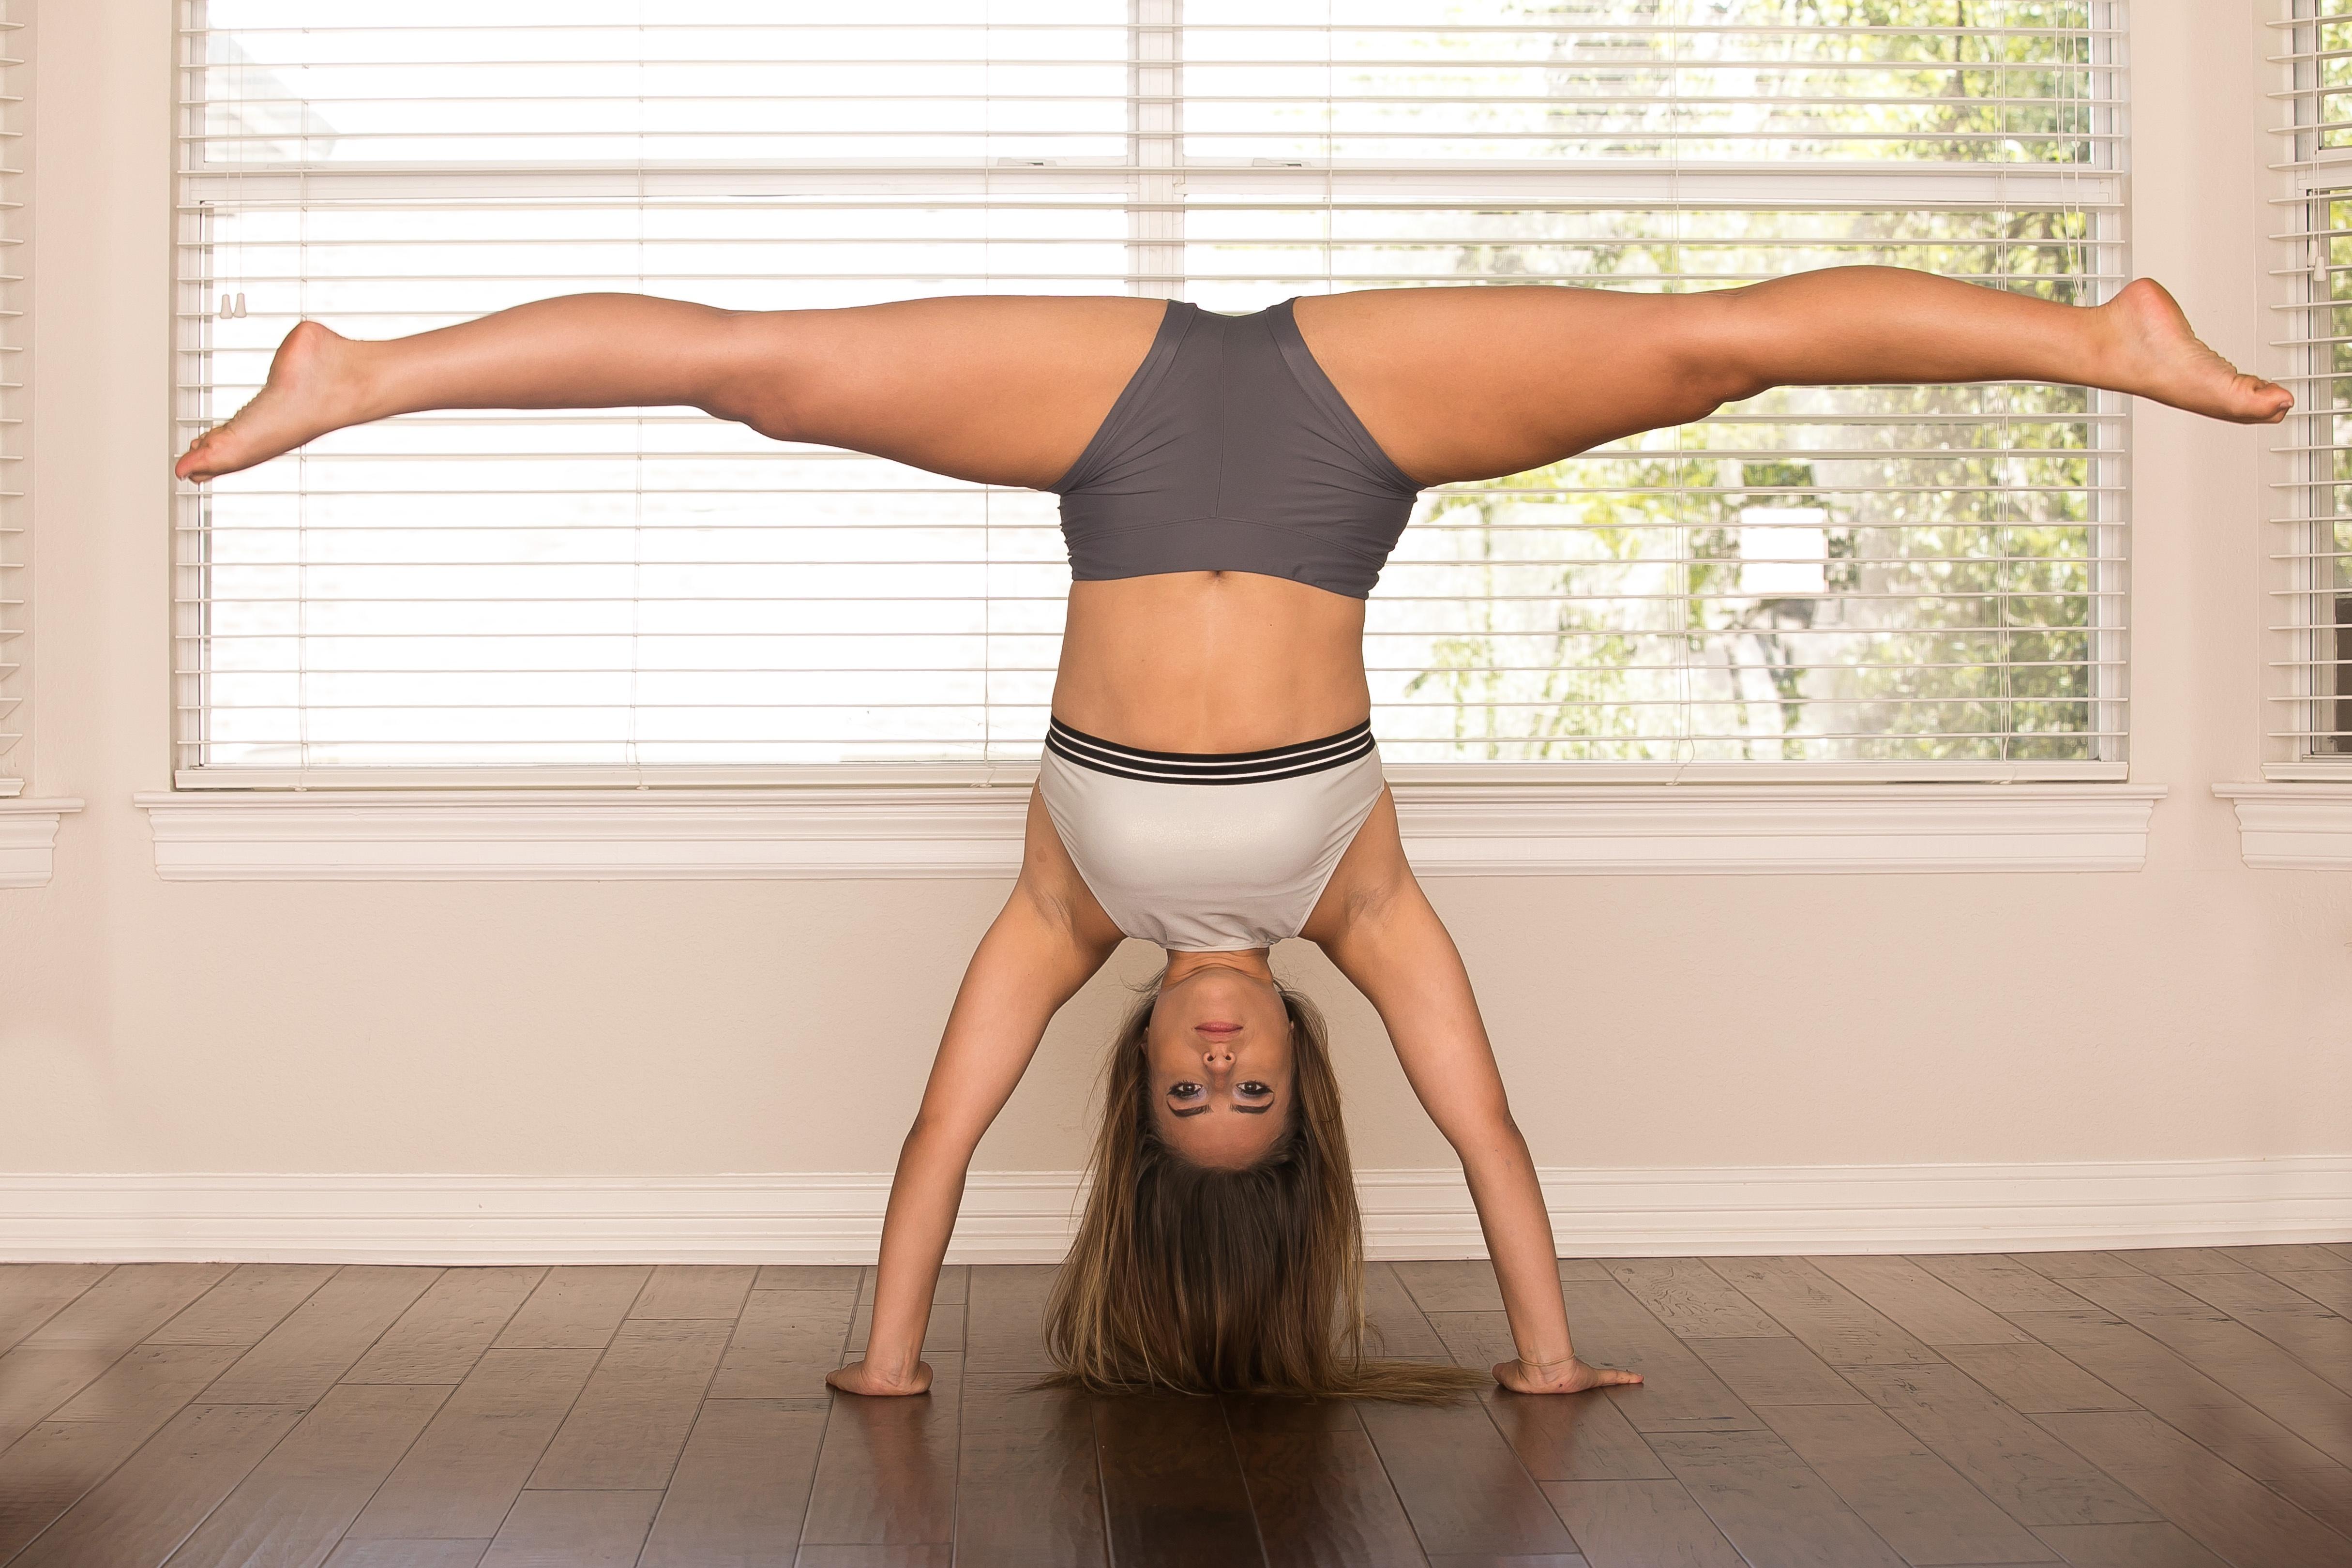 wallpaper : gymnastics, spread legs, barefoot, women, model